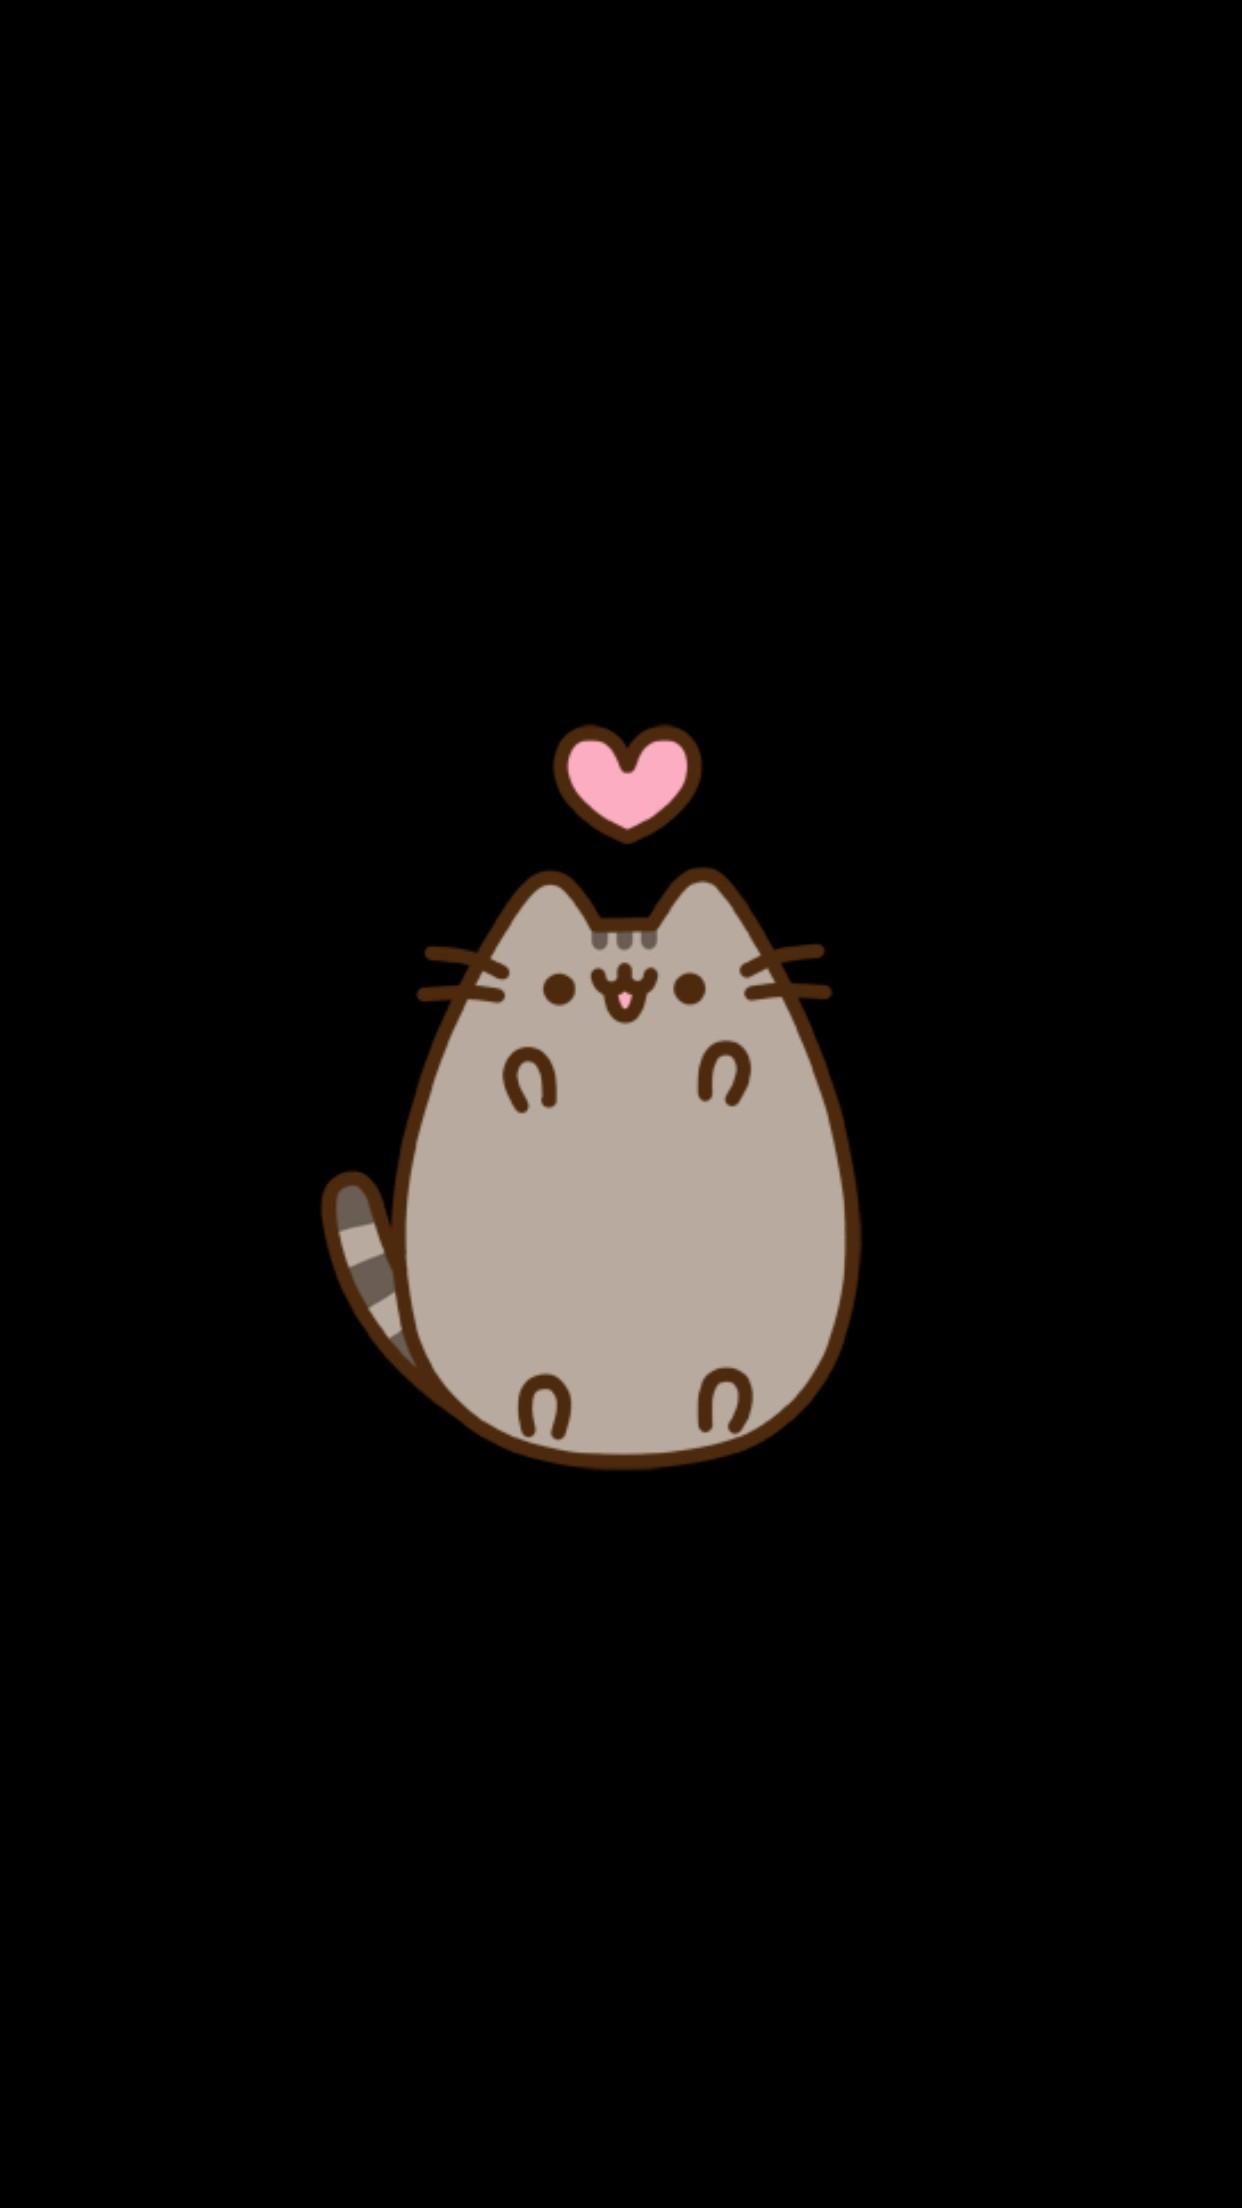 Wallpaper Iphone Cute Wallpapers Pusheen Nyan Cat Gif - Cute Wallpaper Iphone Pusheen , HD Wallpaper & Backgrounds